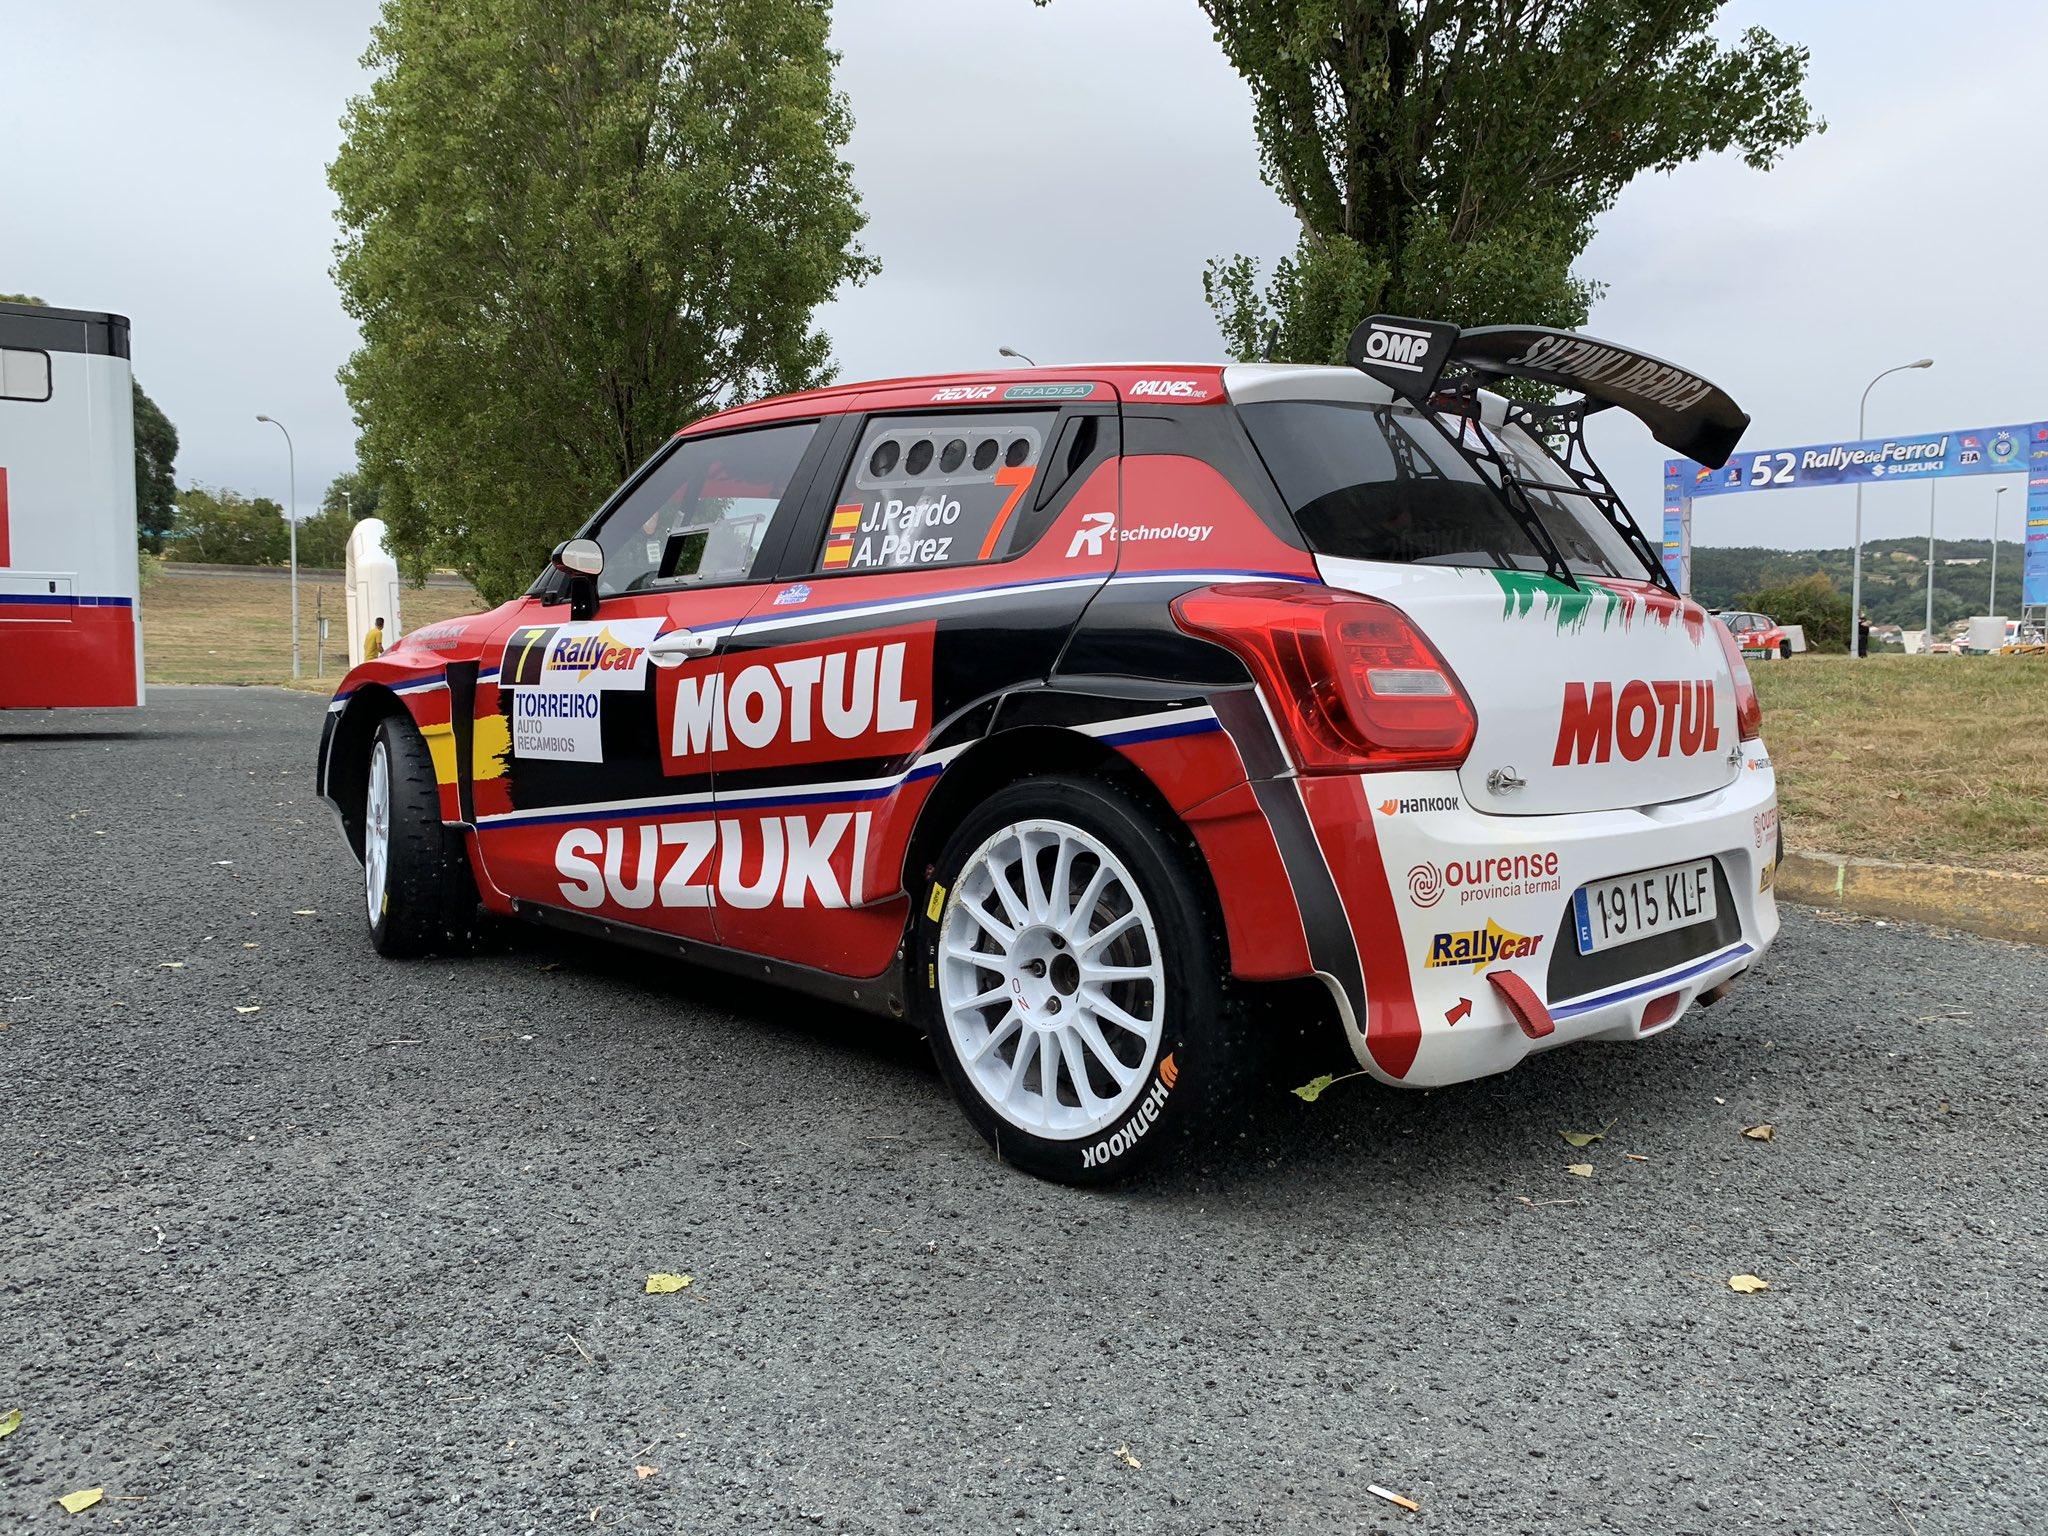 SCER + TER: 52º Rallye de Ferrol - Suzuki [20-21 Agosto] - Página 2 E9TK9TzWQAYygHh?format=jpg&name=large